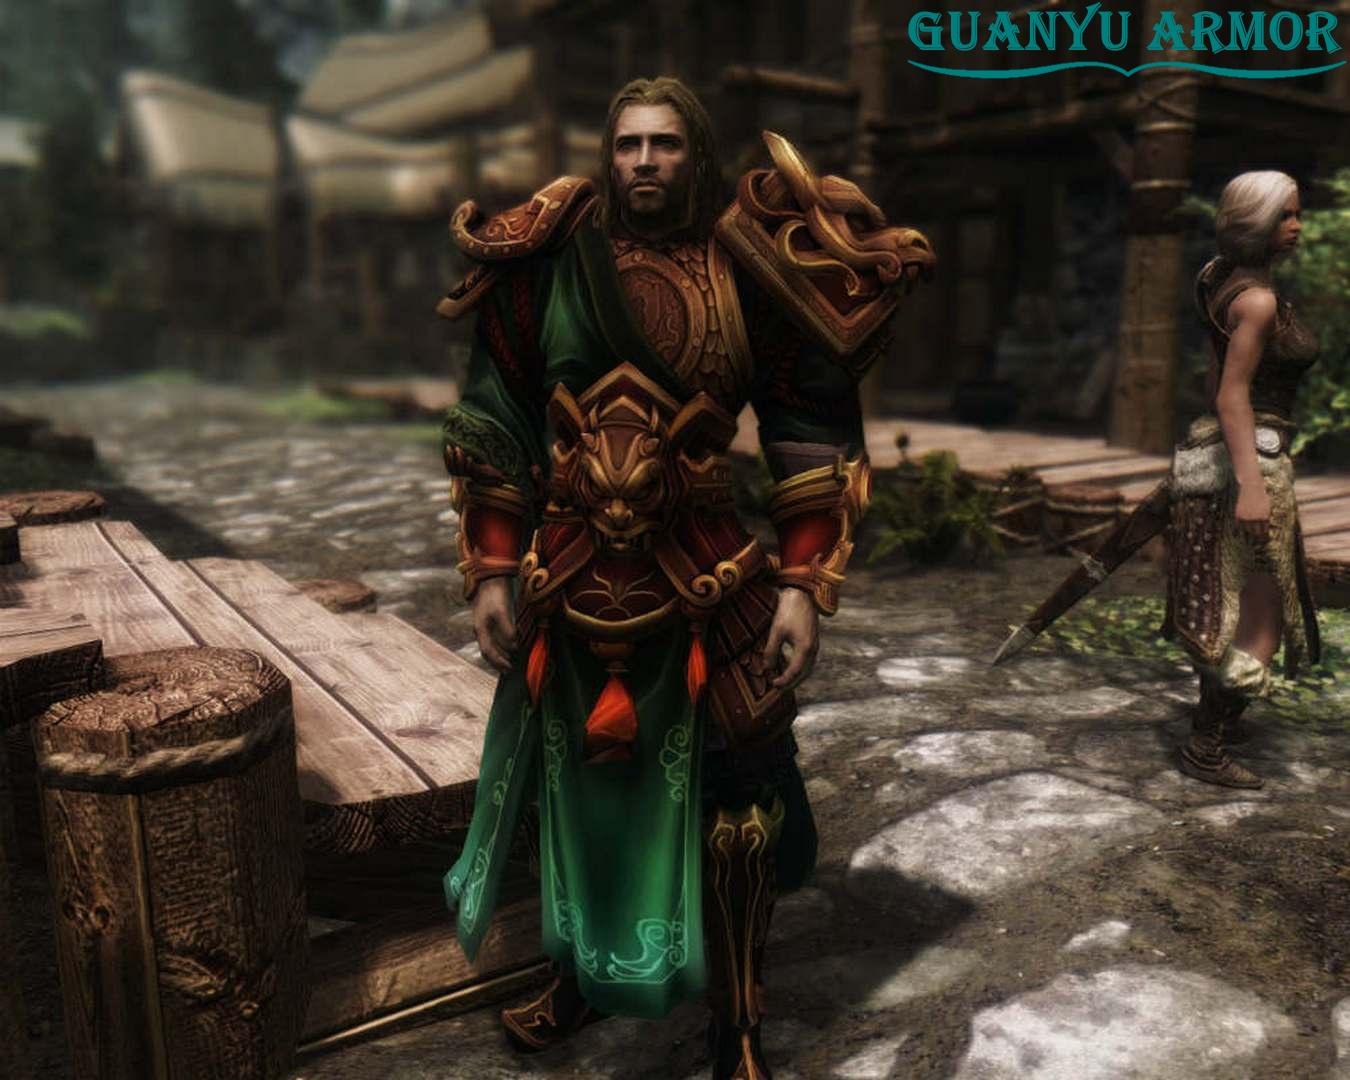 Guanyu_Armor.jpg